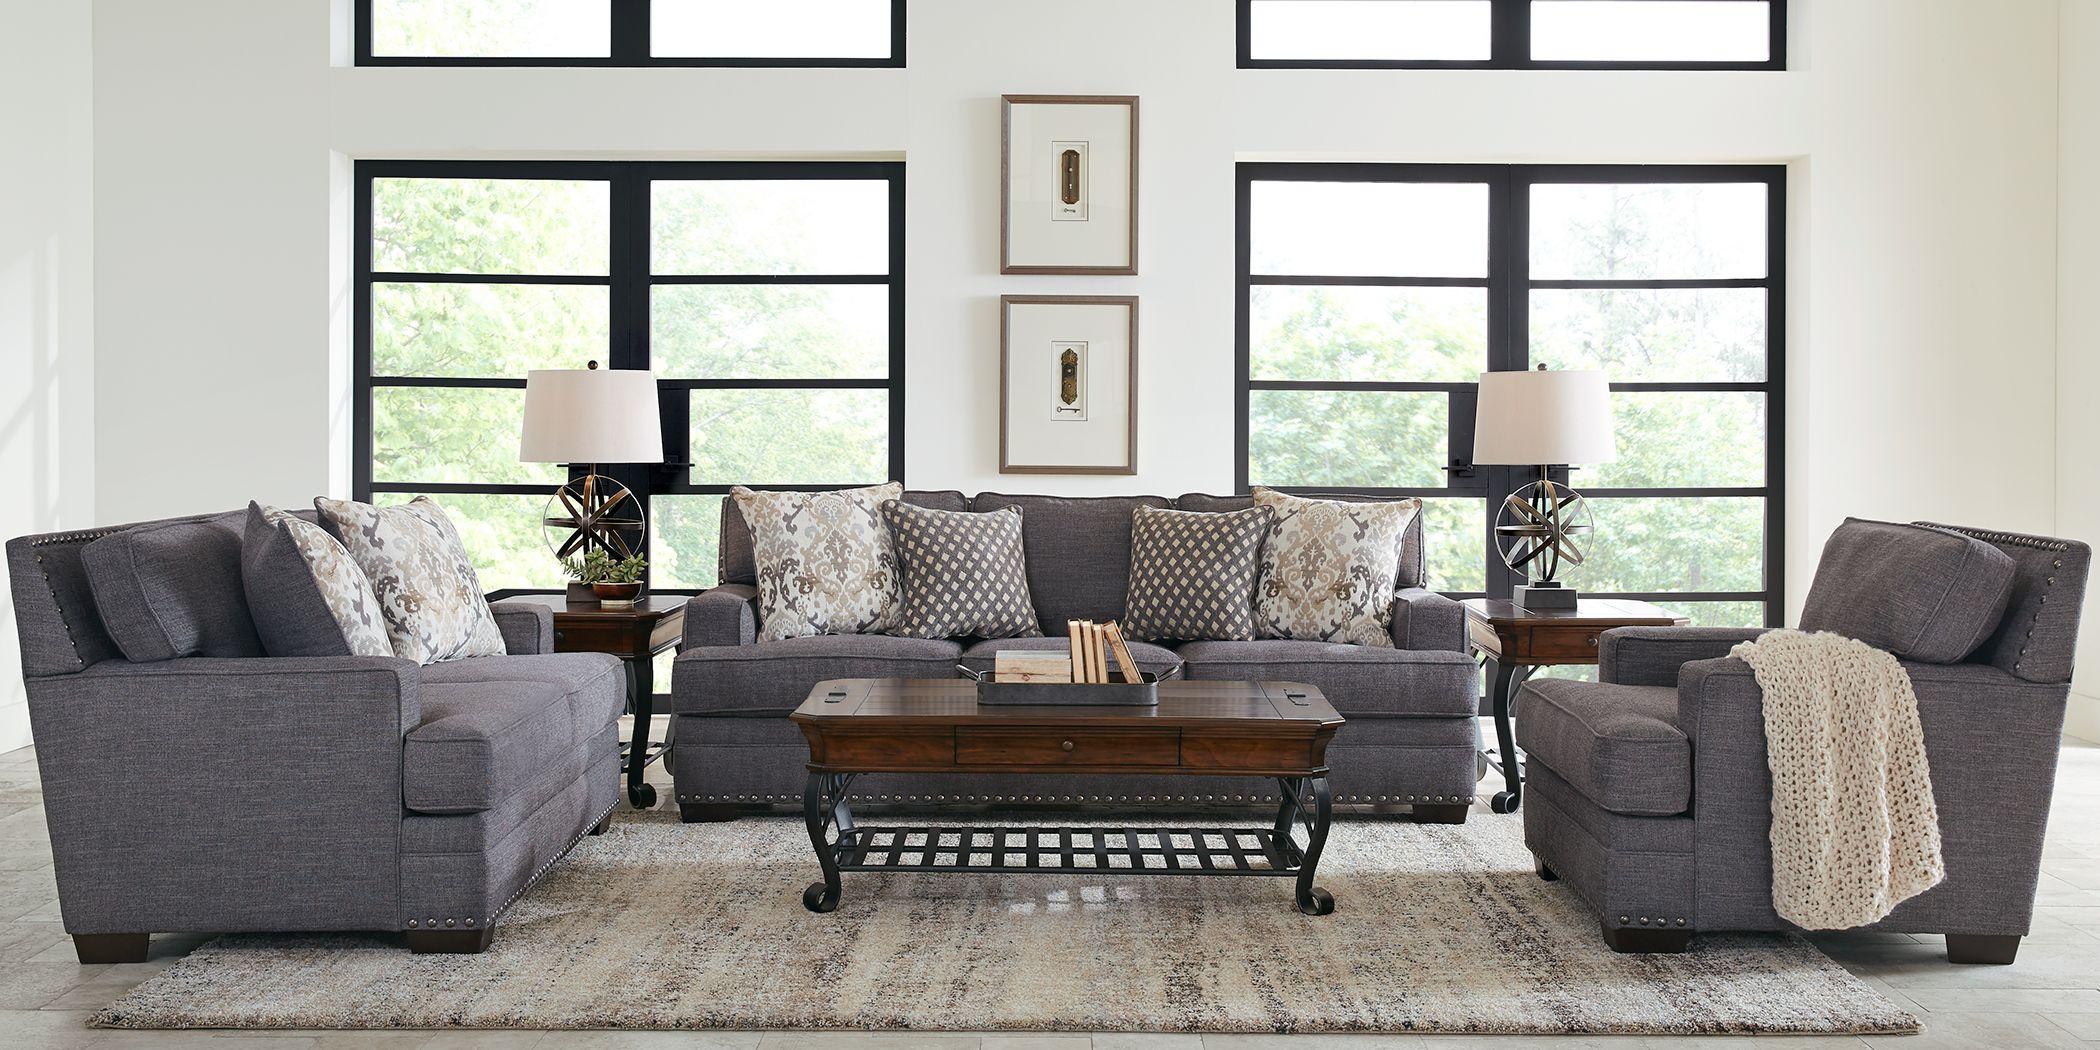 2 Piece Living Room Sofa Sets Of Furniture, Grey Living Room Stools